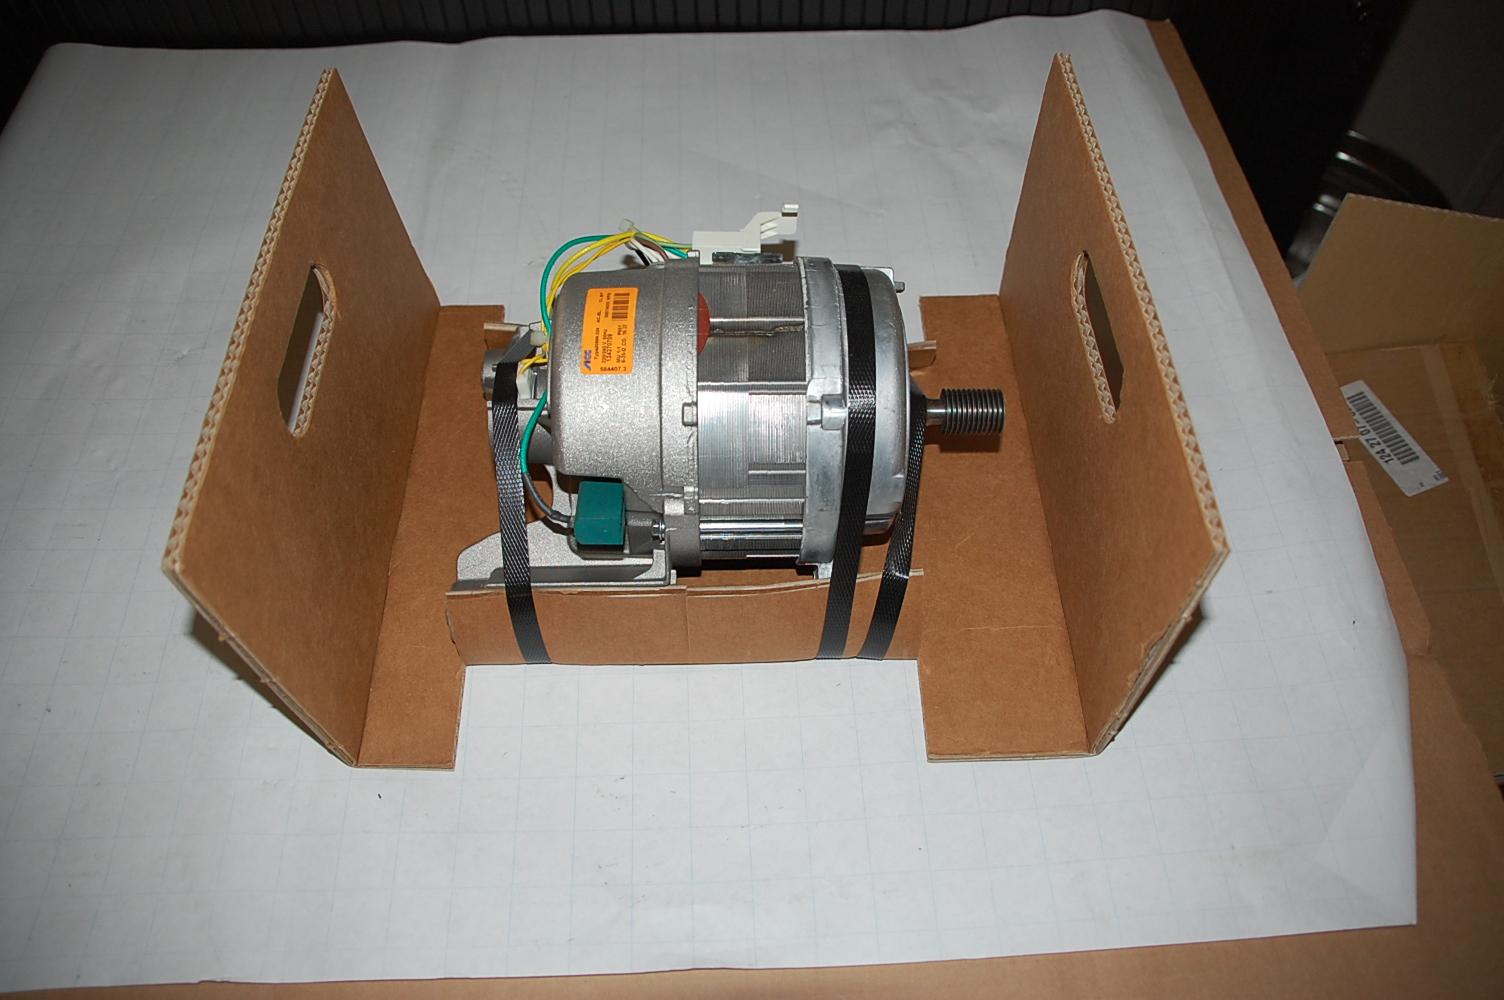 Lavita motor W1-18515